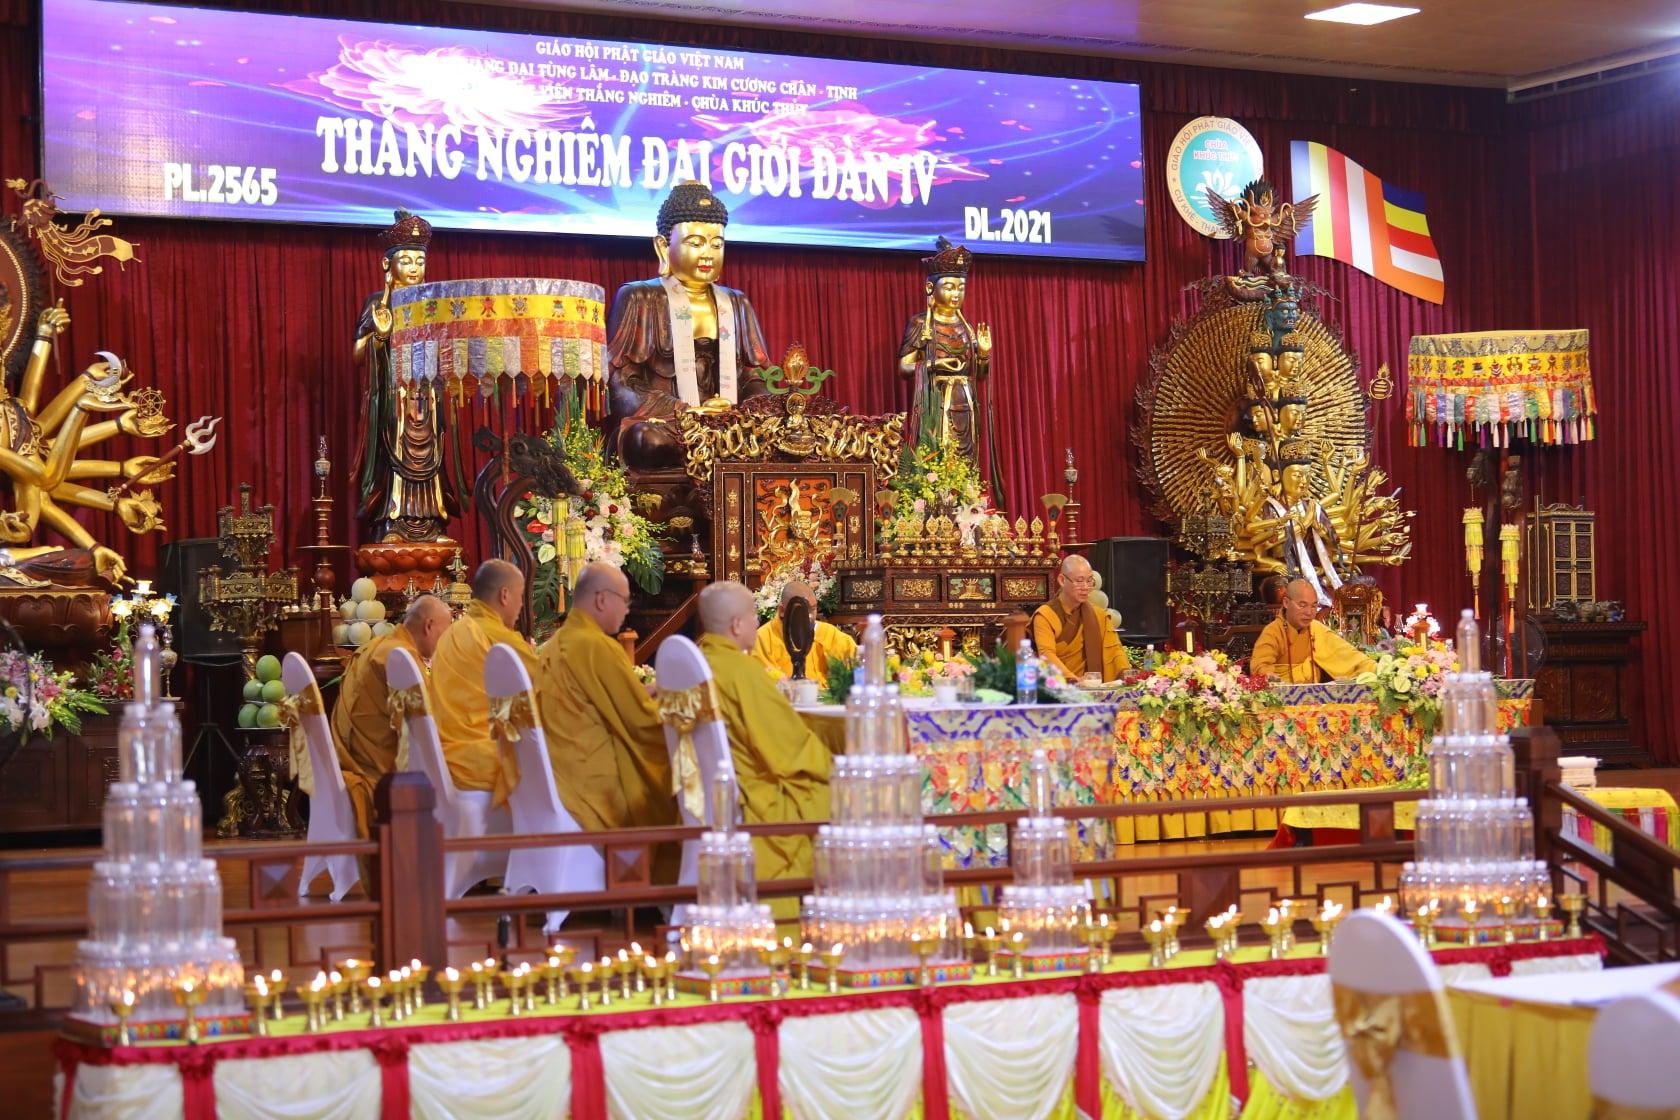 Thang Nghiem Dai Gioi Dan IV (8)